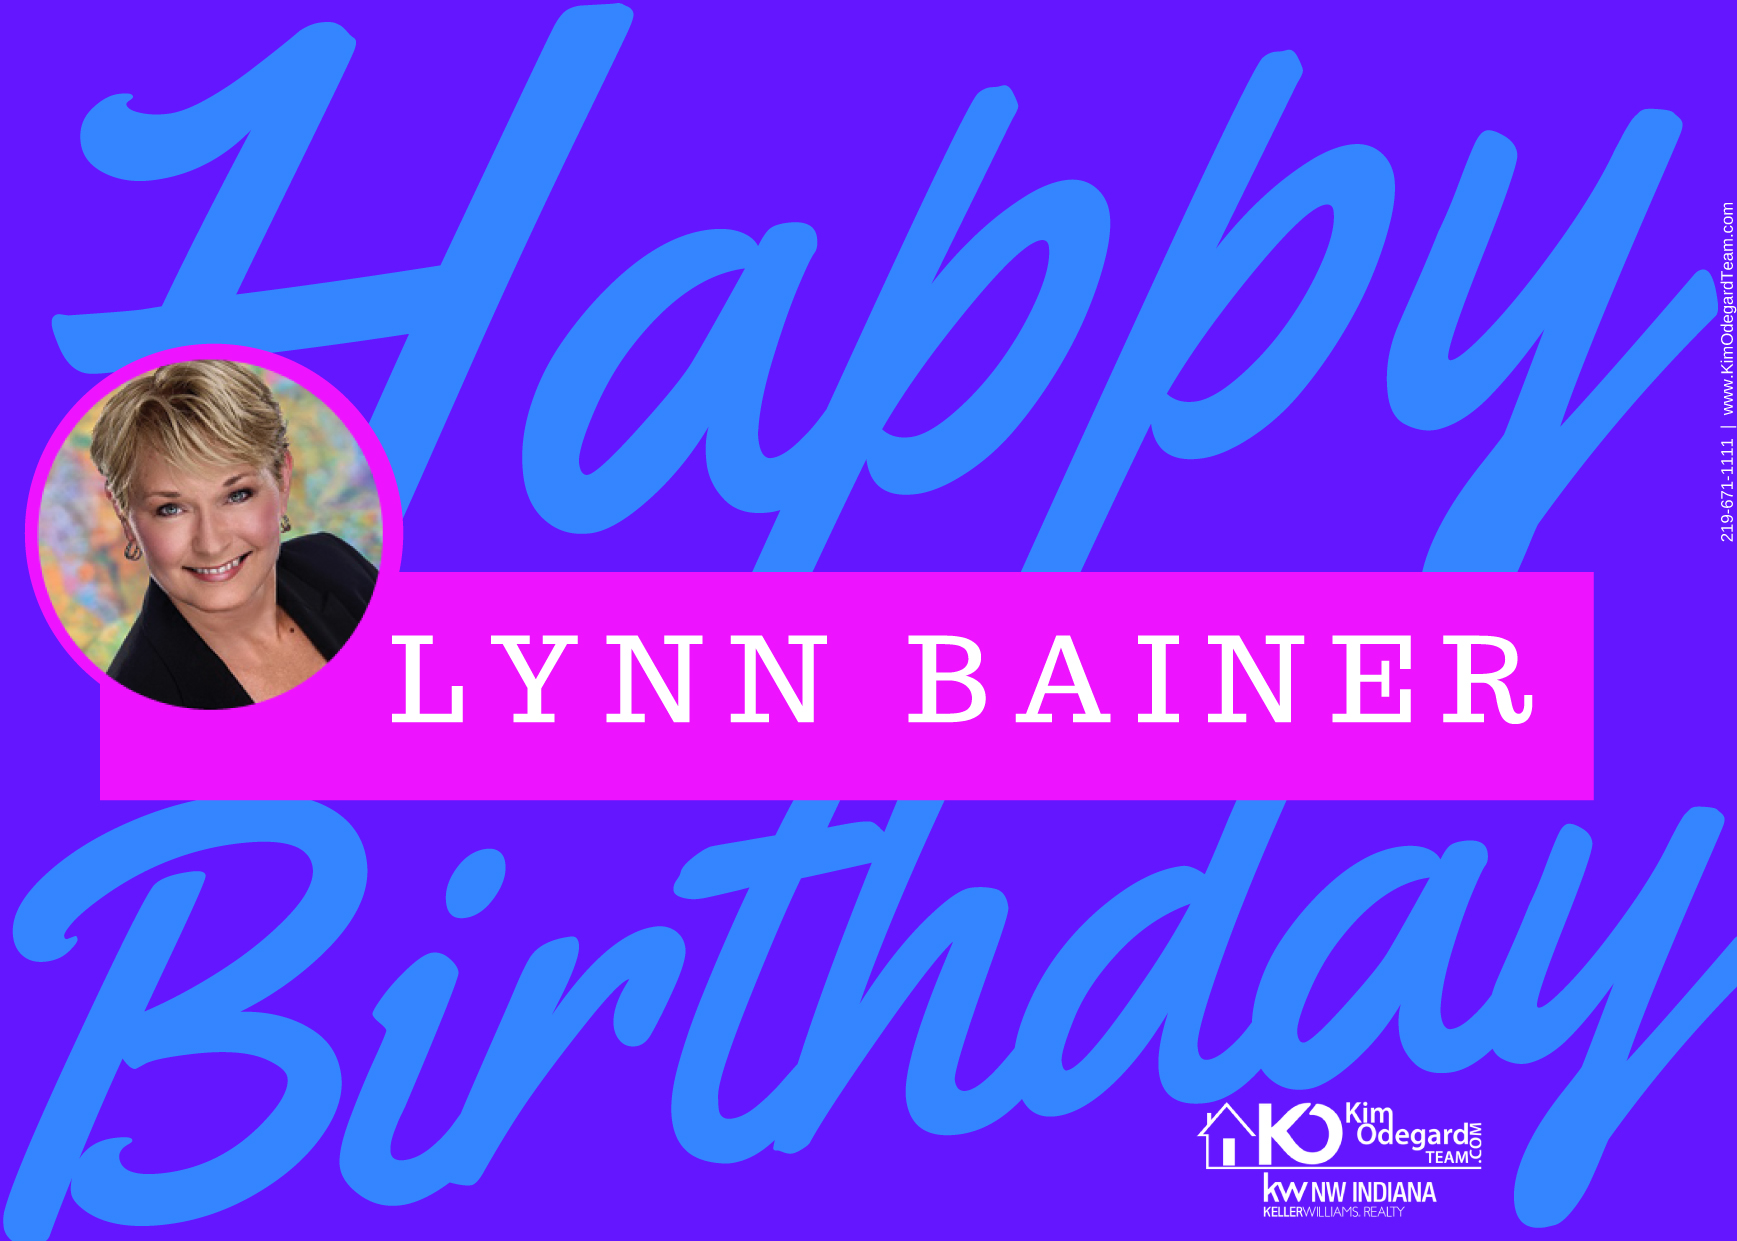 Happy Birthday To Kim Odegard Teams Buyers Agent Lynn Bainer